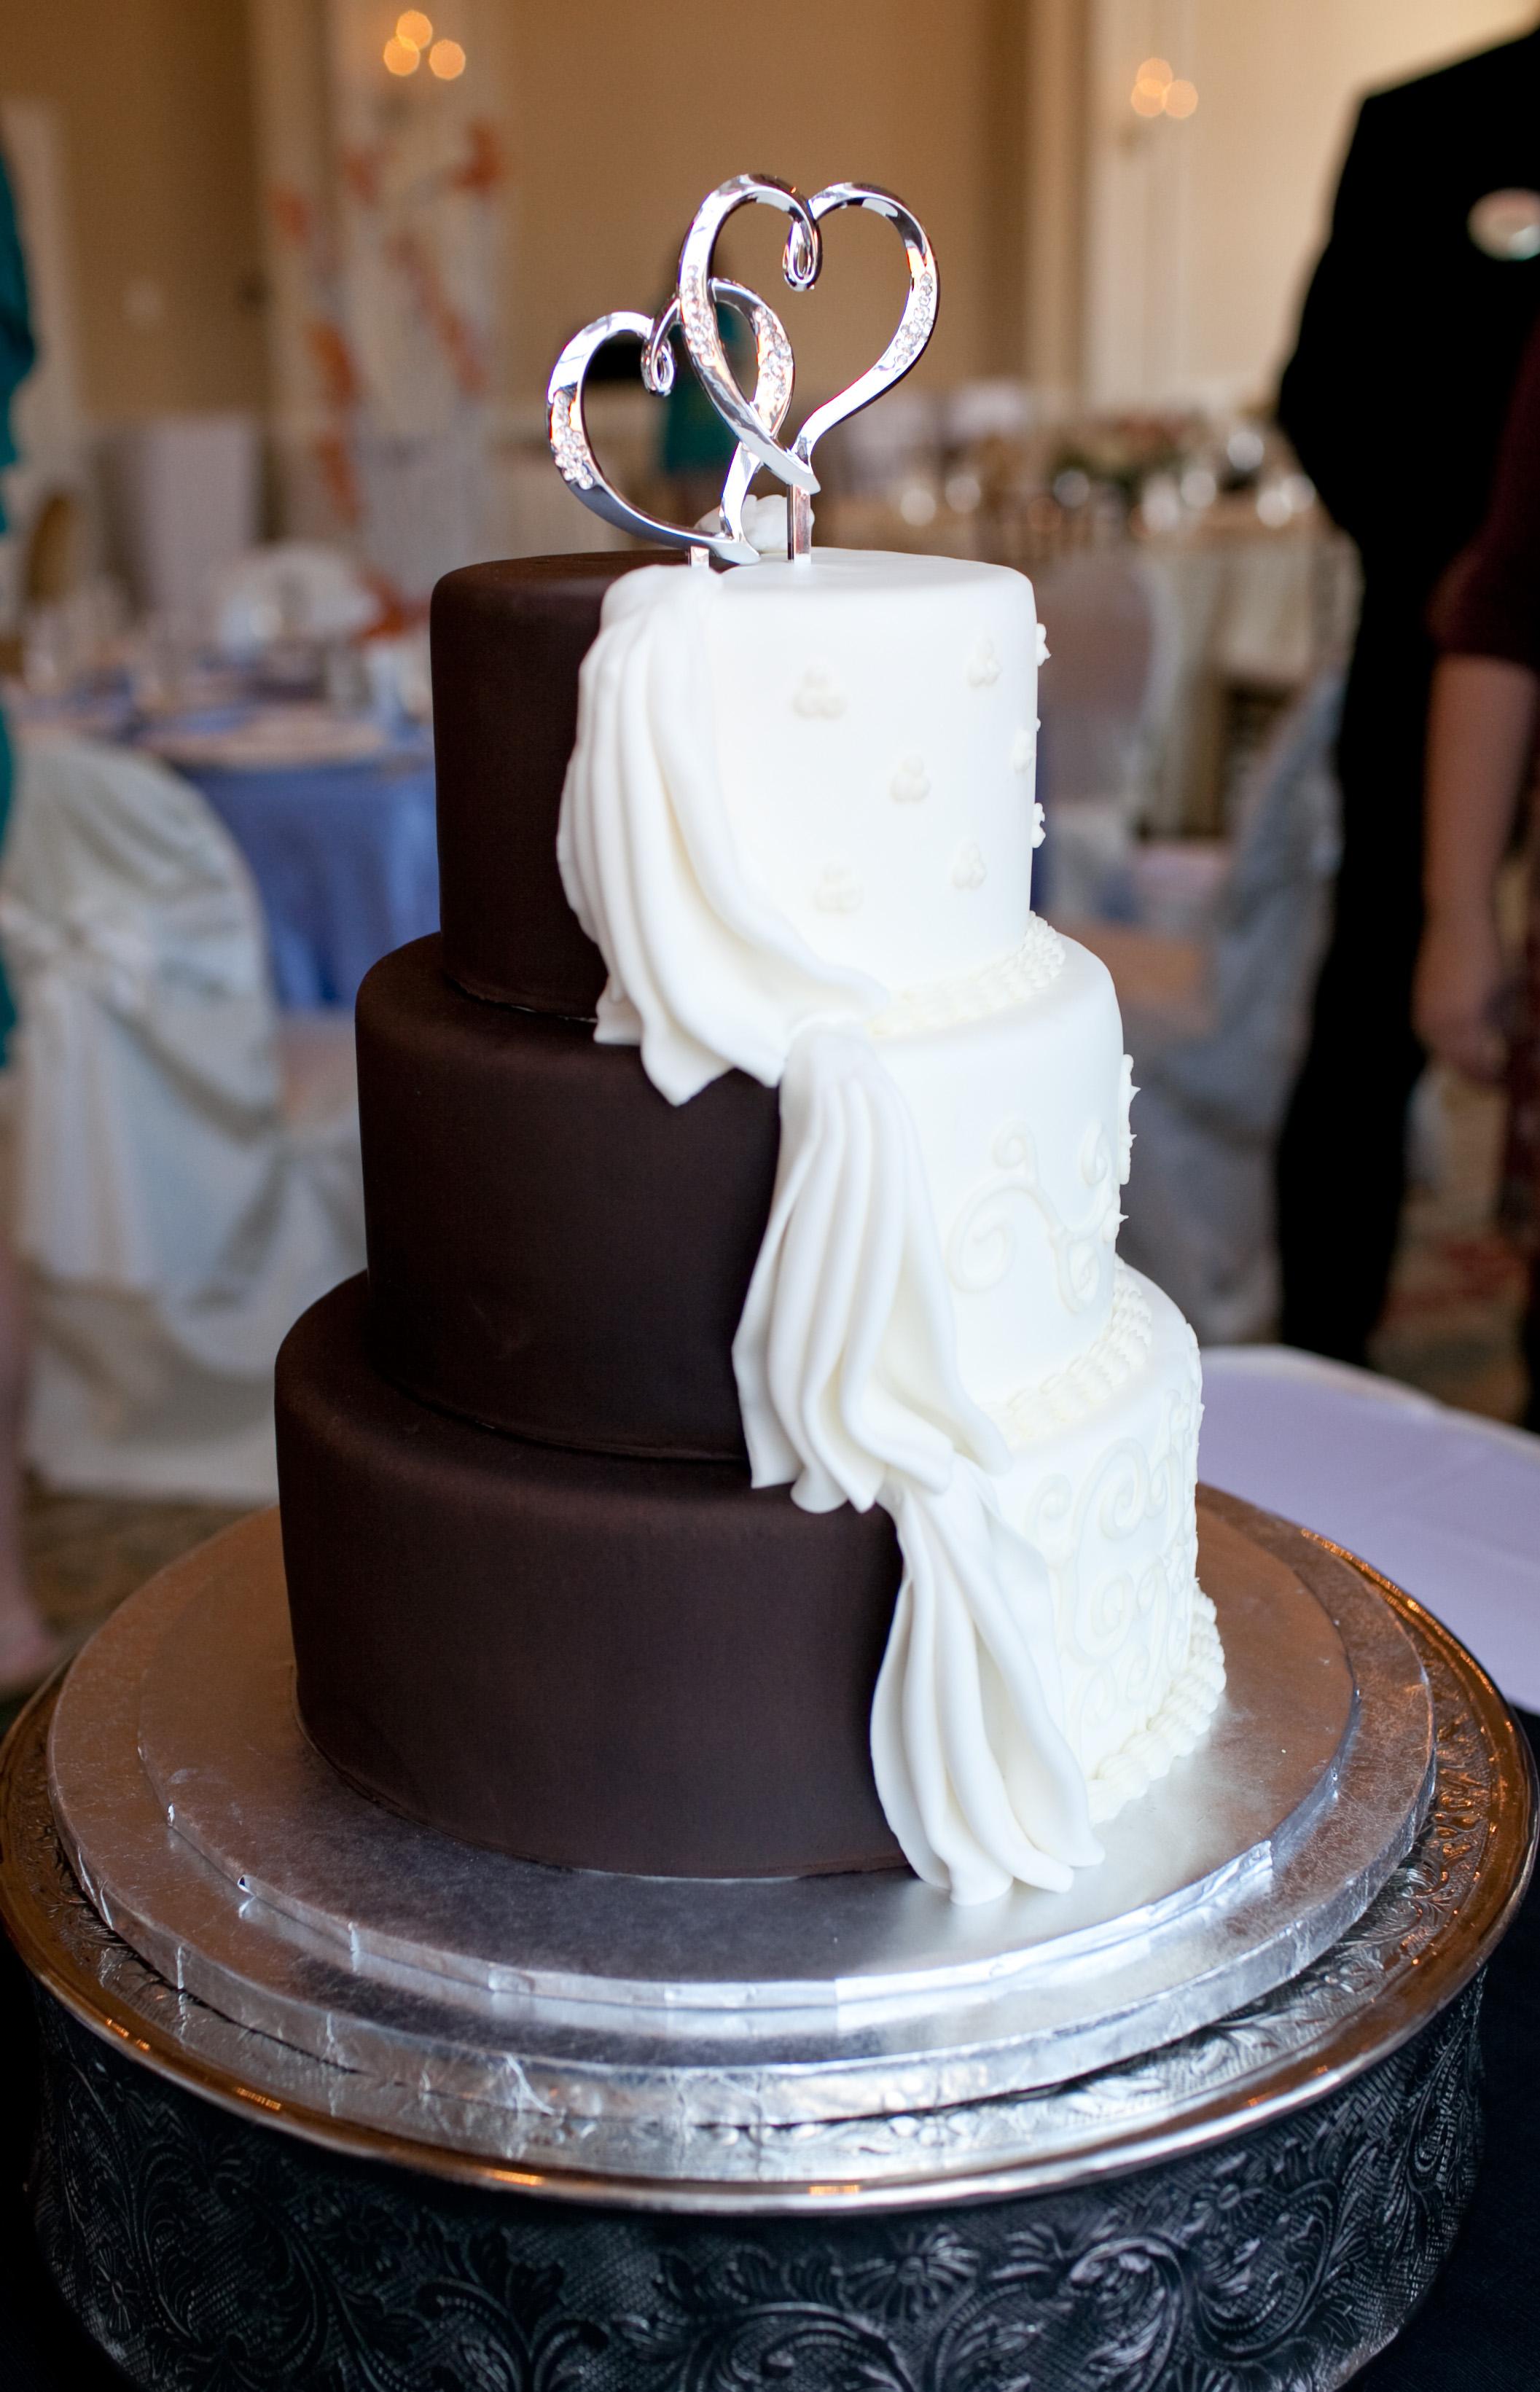 Wedding Cake clipart cack Full Cake Traditional : Cakes